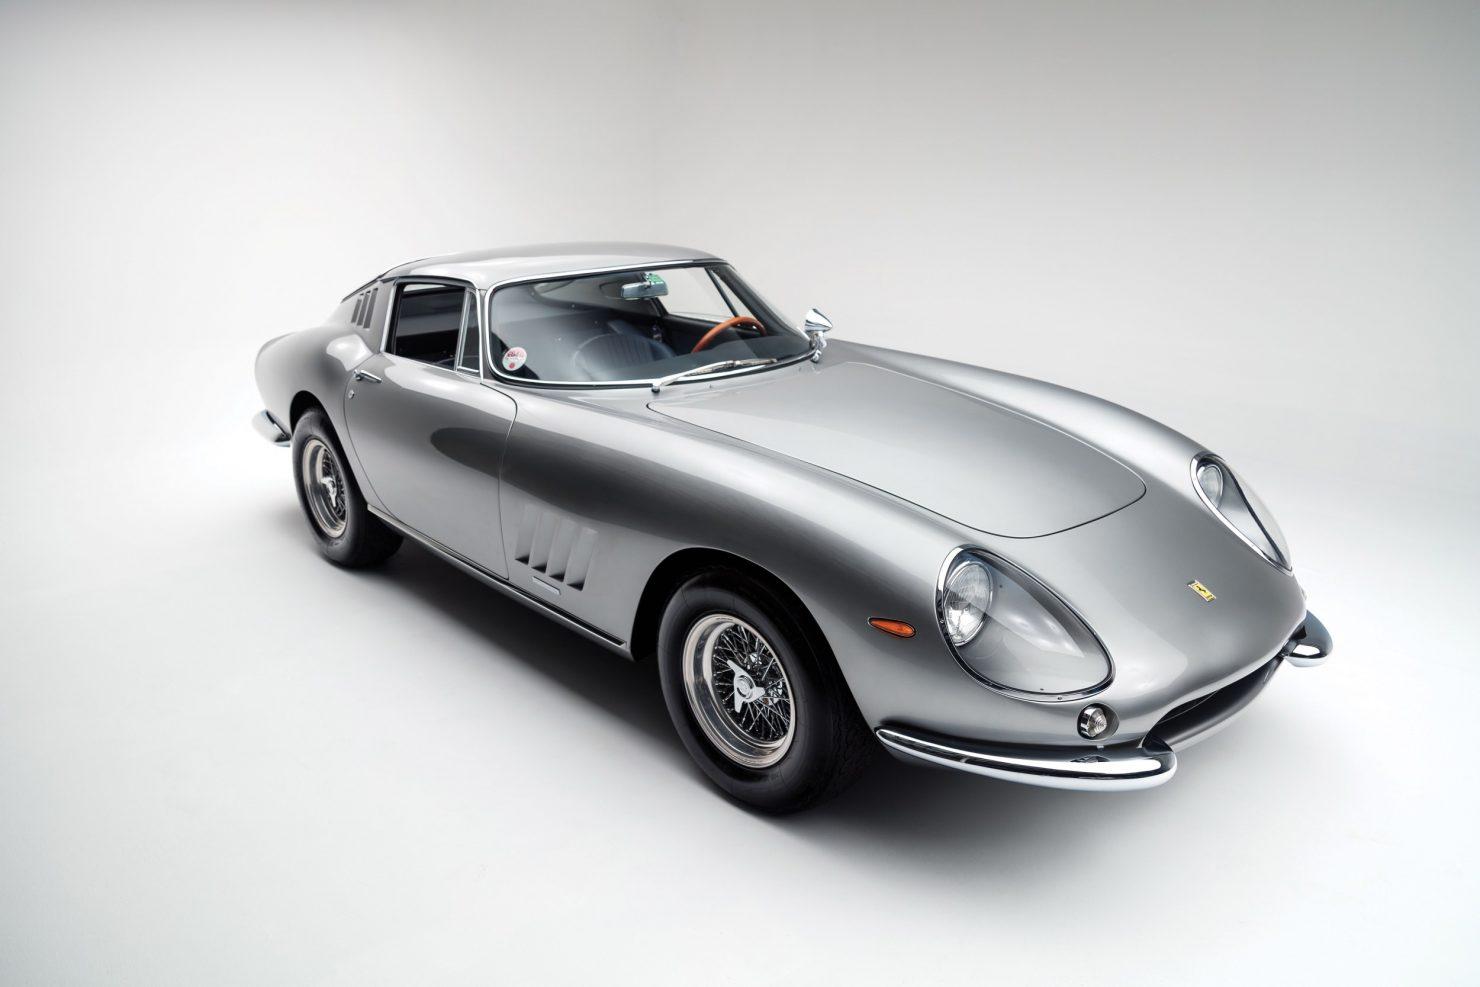 ferrari 275 gtb car 17 1480x987 - 1965 Ferrari 275 GTB/6C Alloy